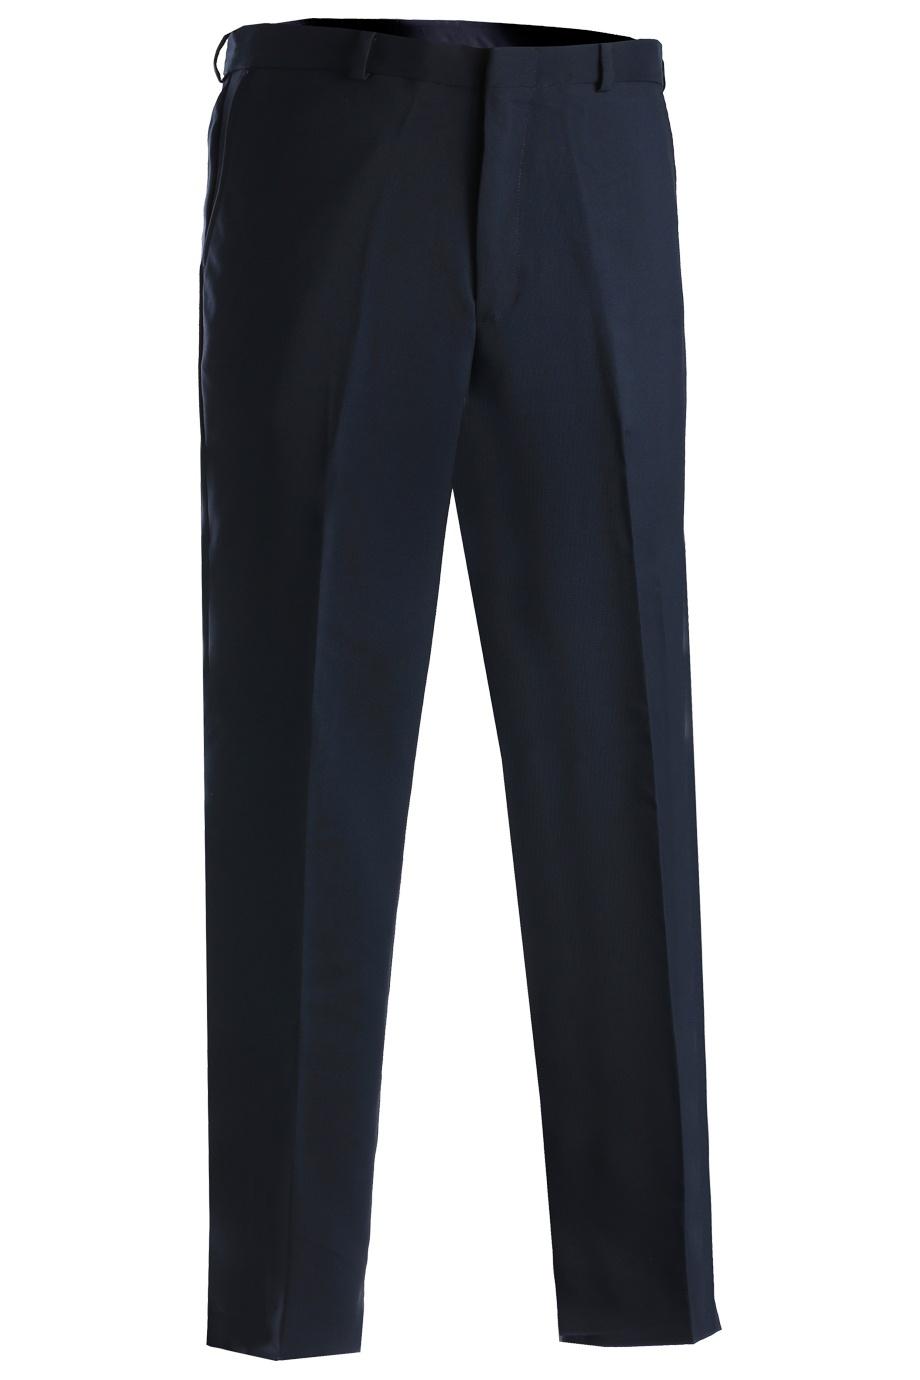 'Edwards 2290 Men's Polyester Flat Front Pant'